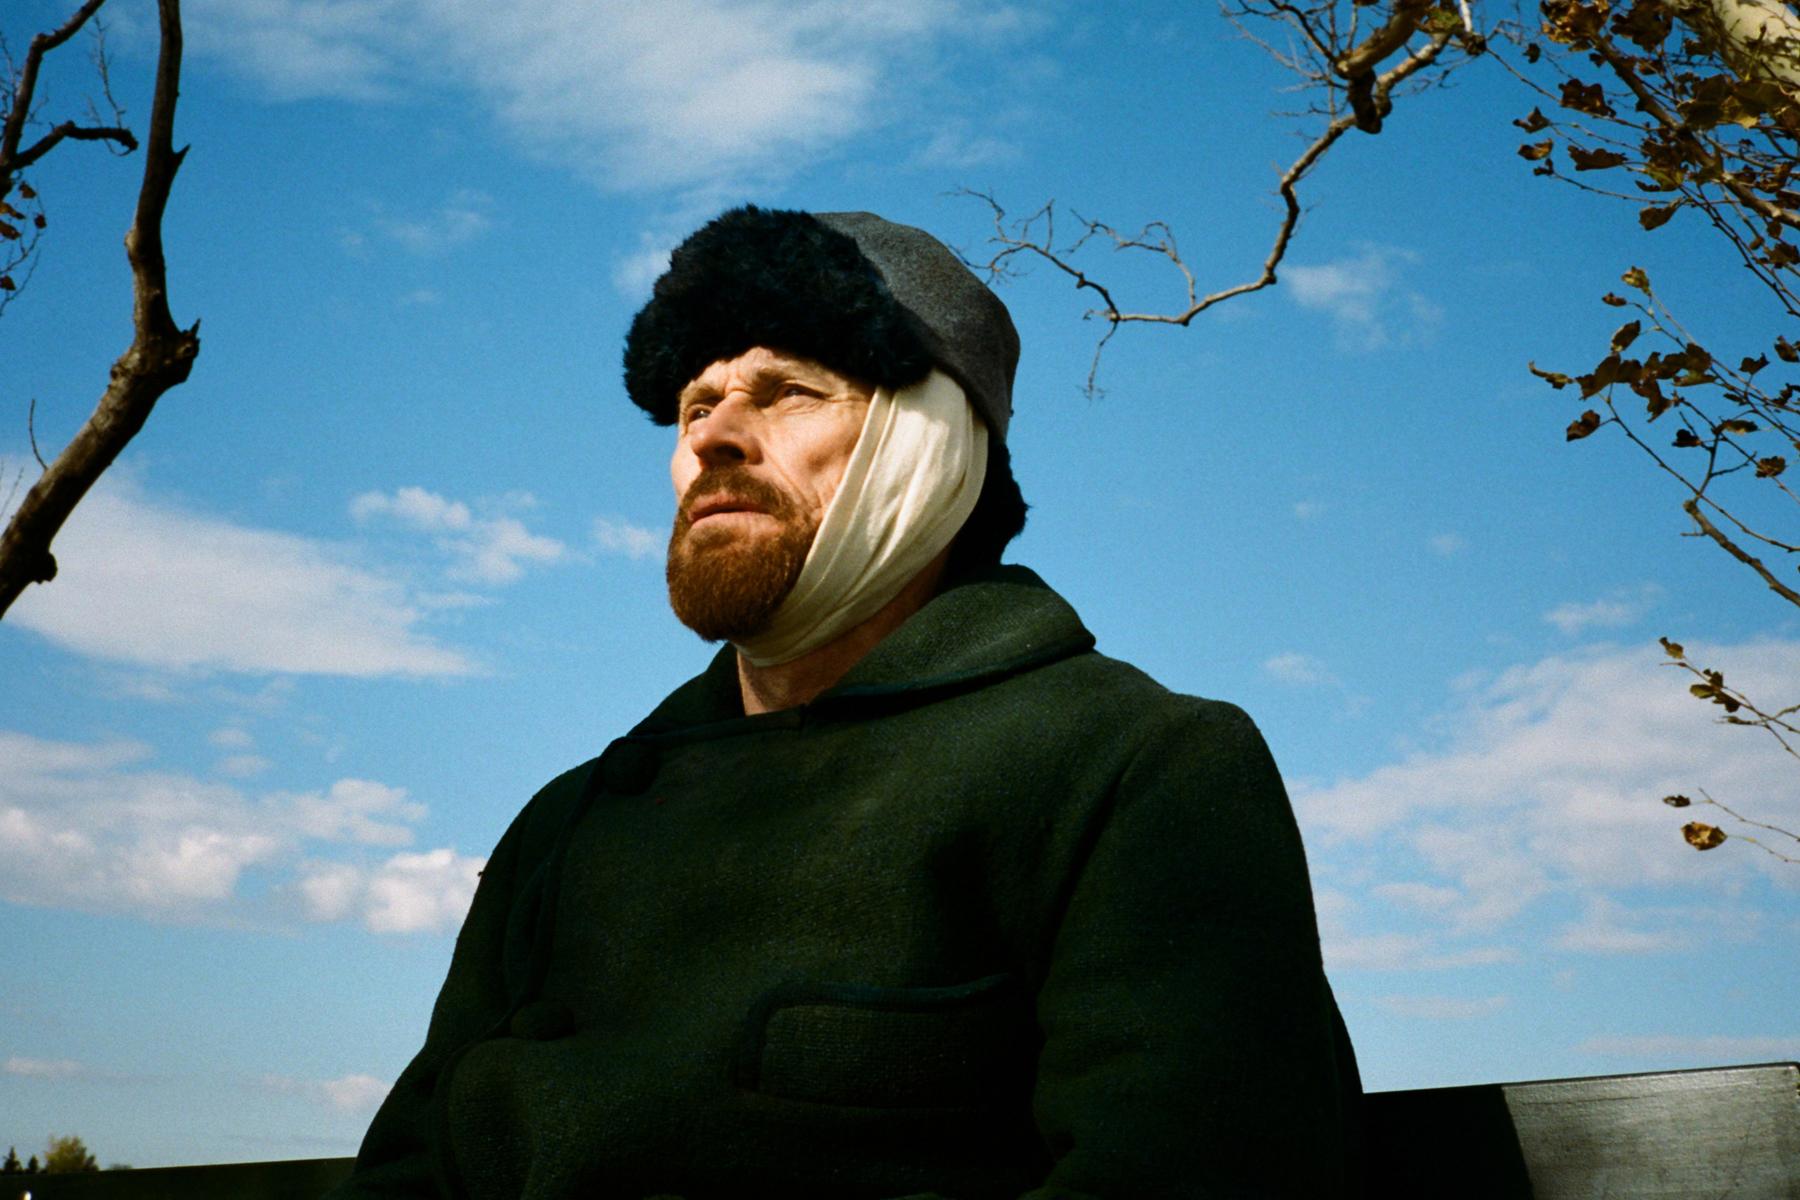 'At Eternity's Gate' Review: The Definitive Portrait of Vincent Van Gogh